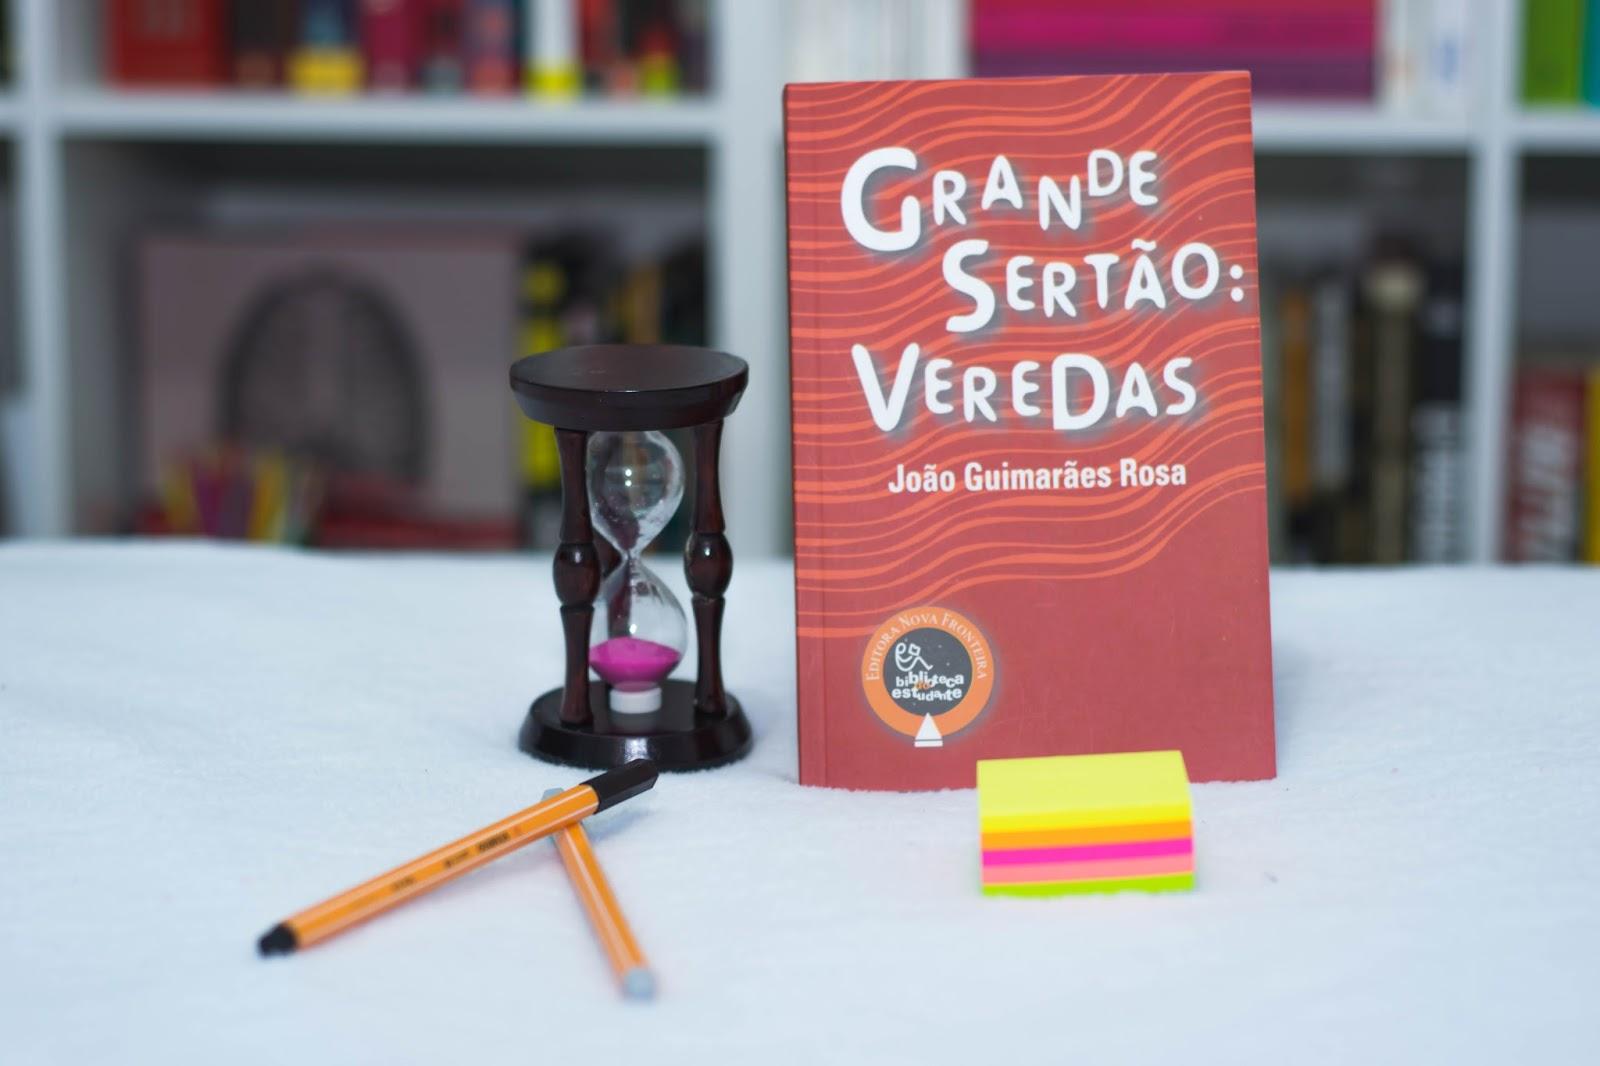 Universo Dos Leitores 54 Frases Incríveis Do Livro Grande